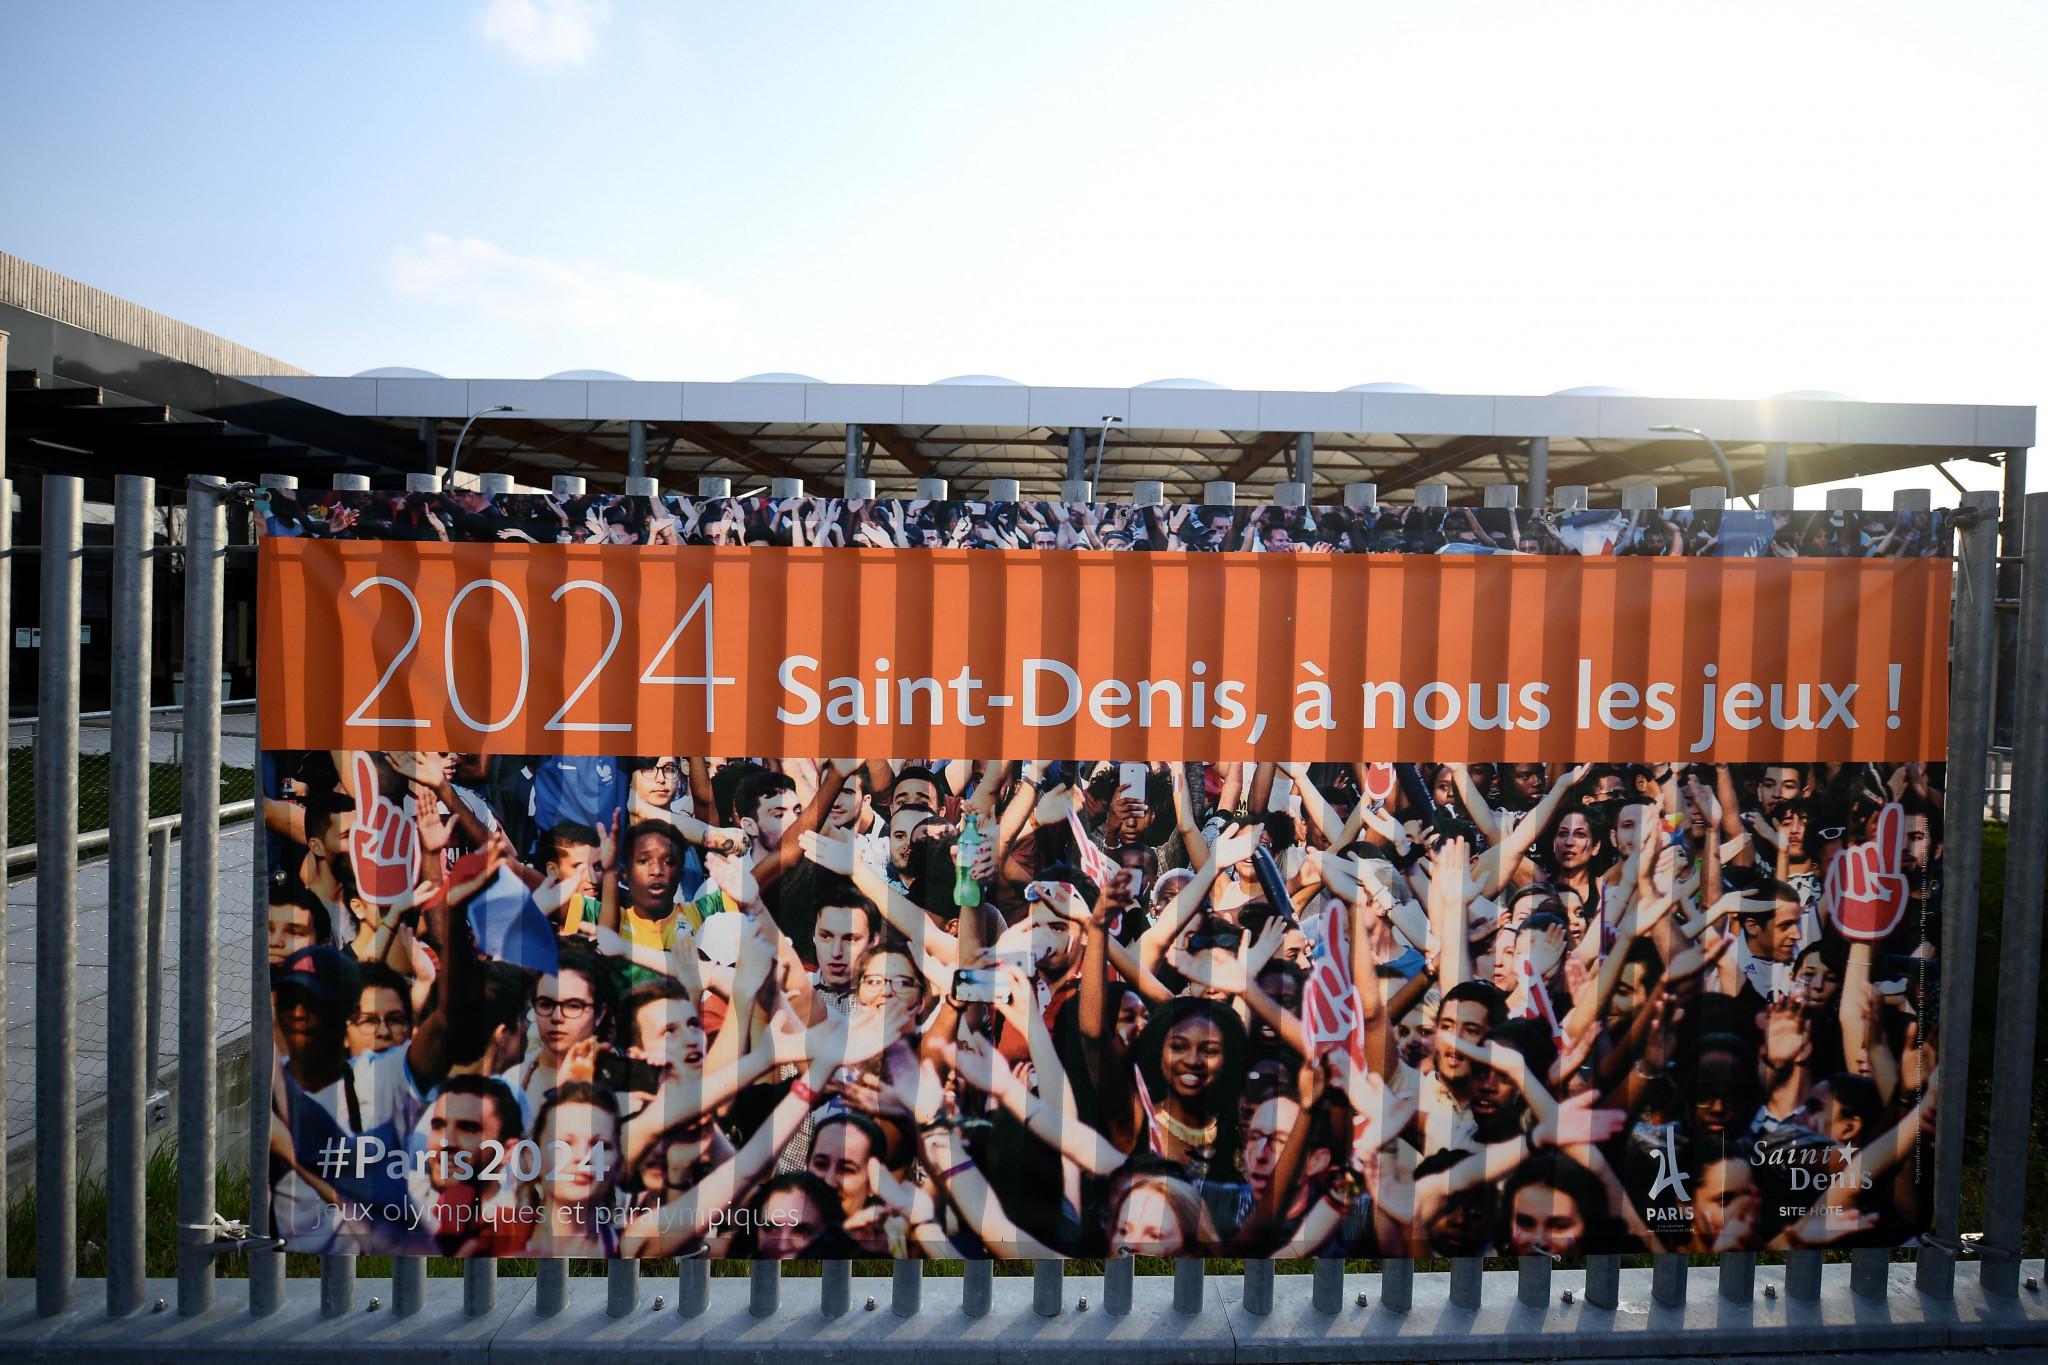 Tony Estanguet highlighted efforts to boost the Seine-Saint Denis region ©Getty Images